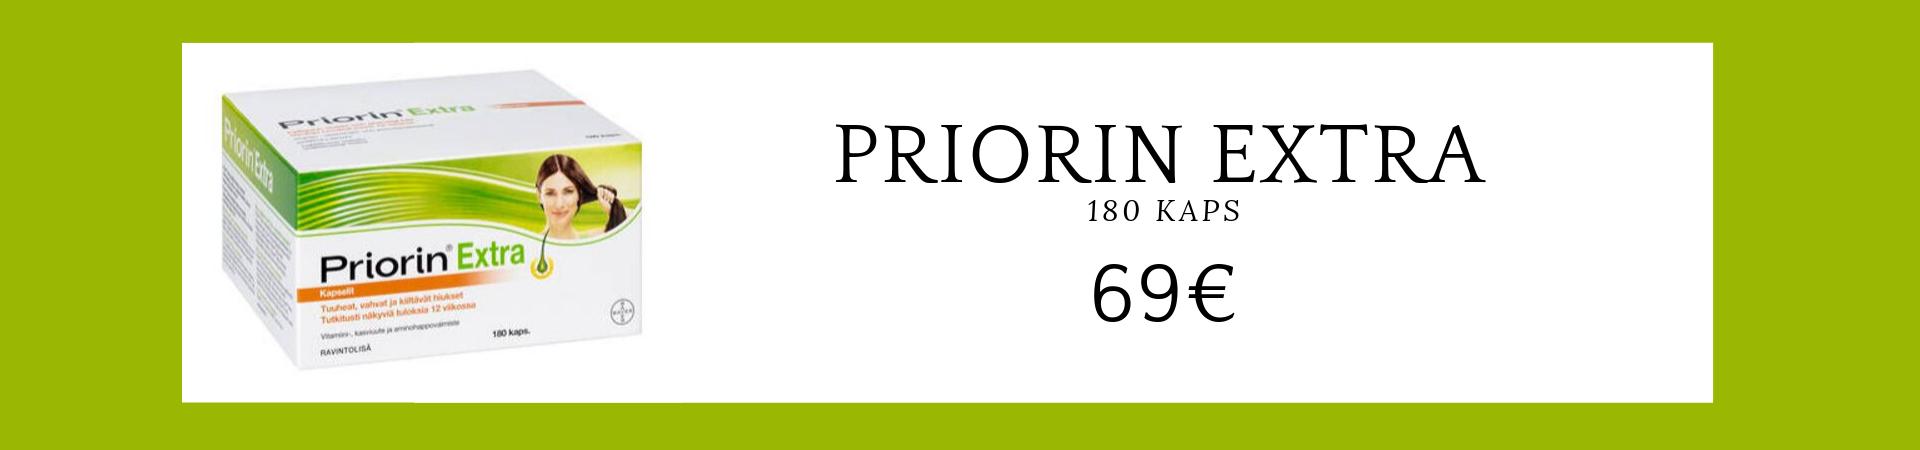 Priorin Extra 180 kaps 69€